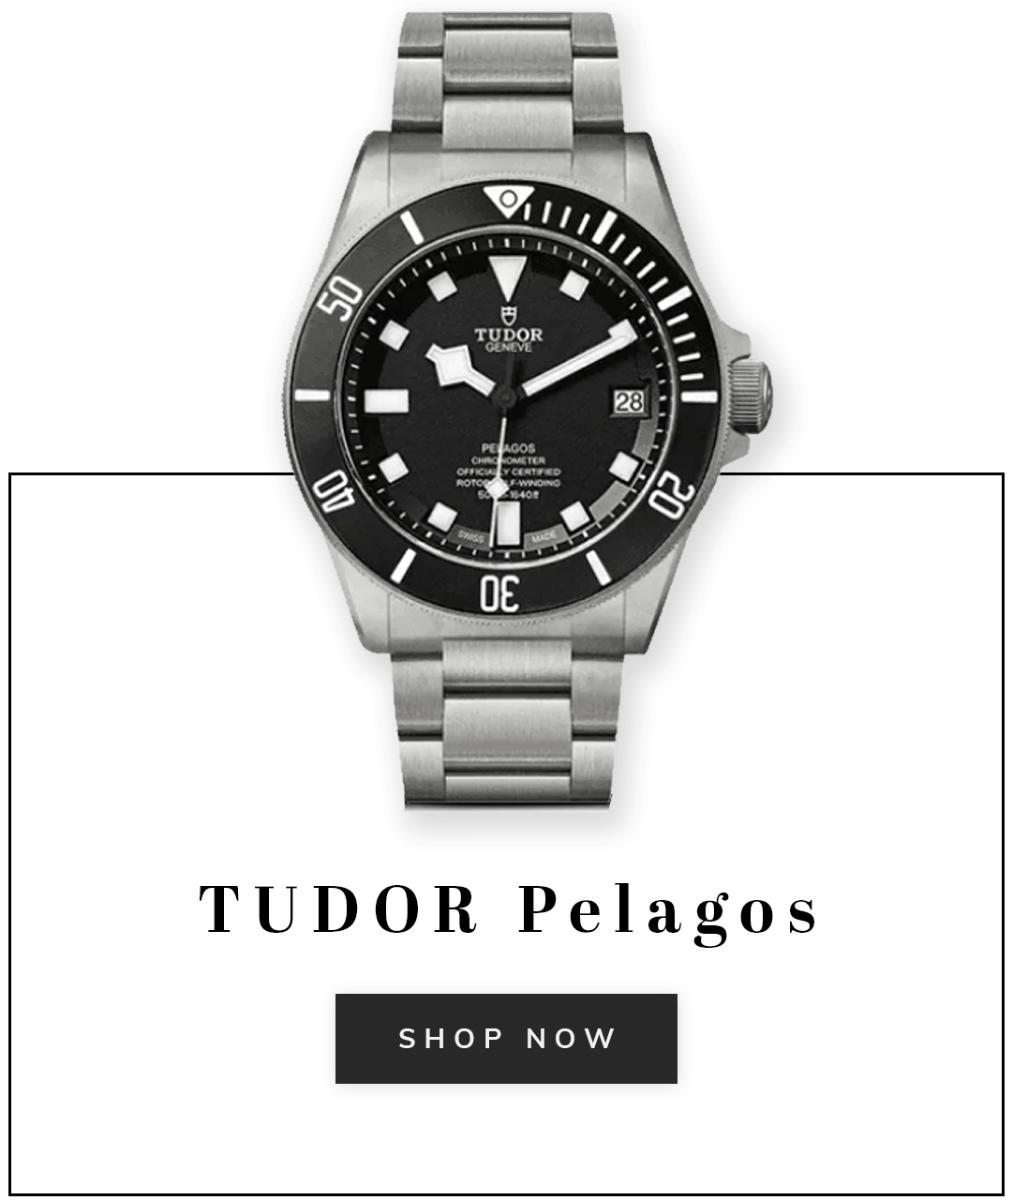 A Tudor Pelagos watch with text shop now